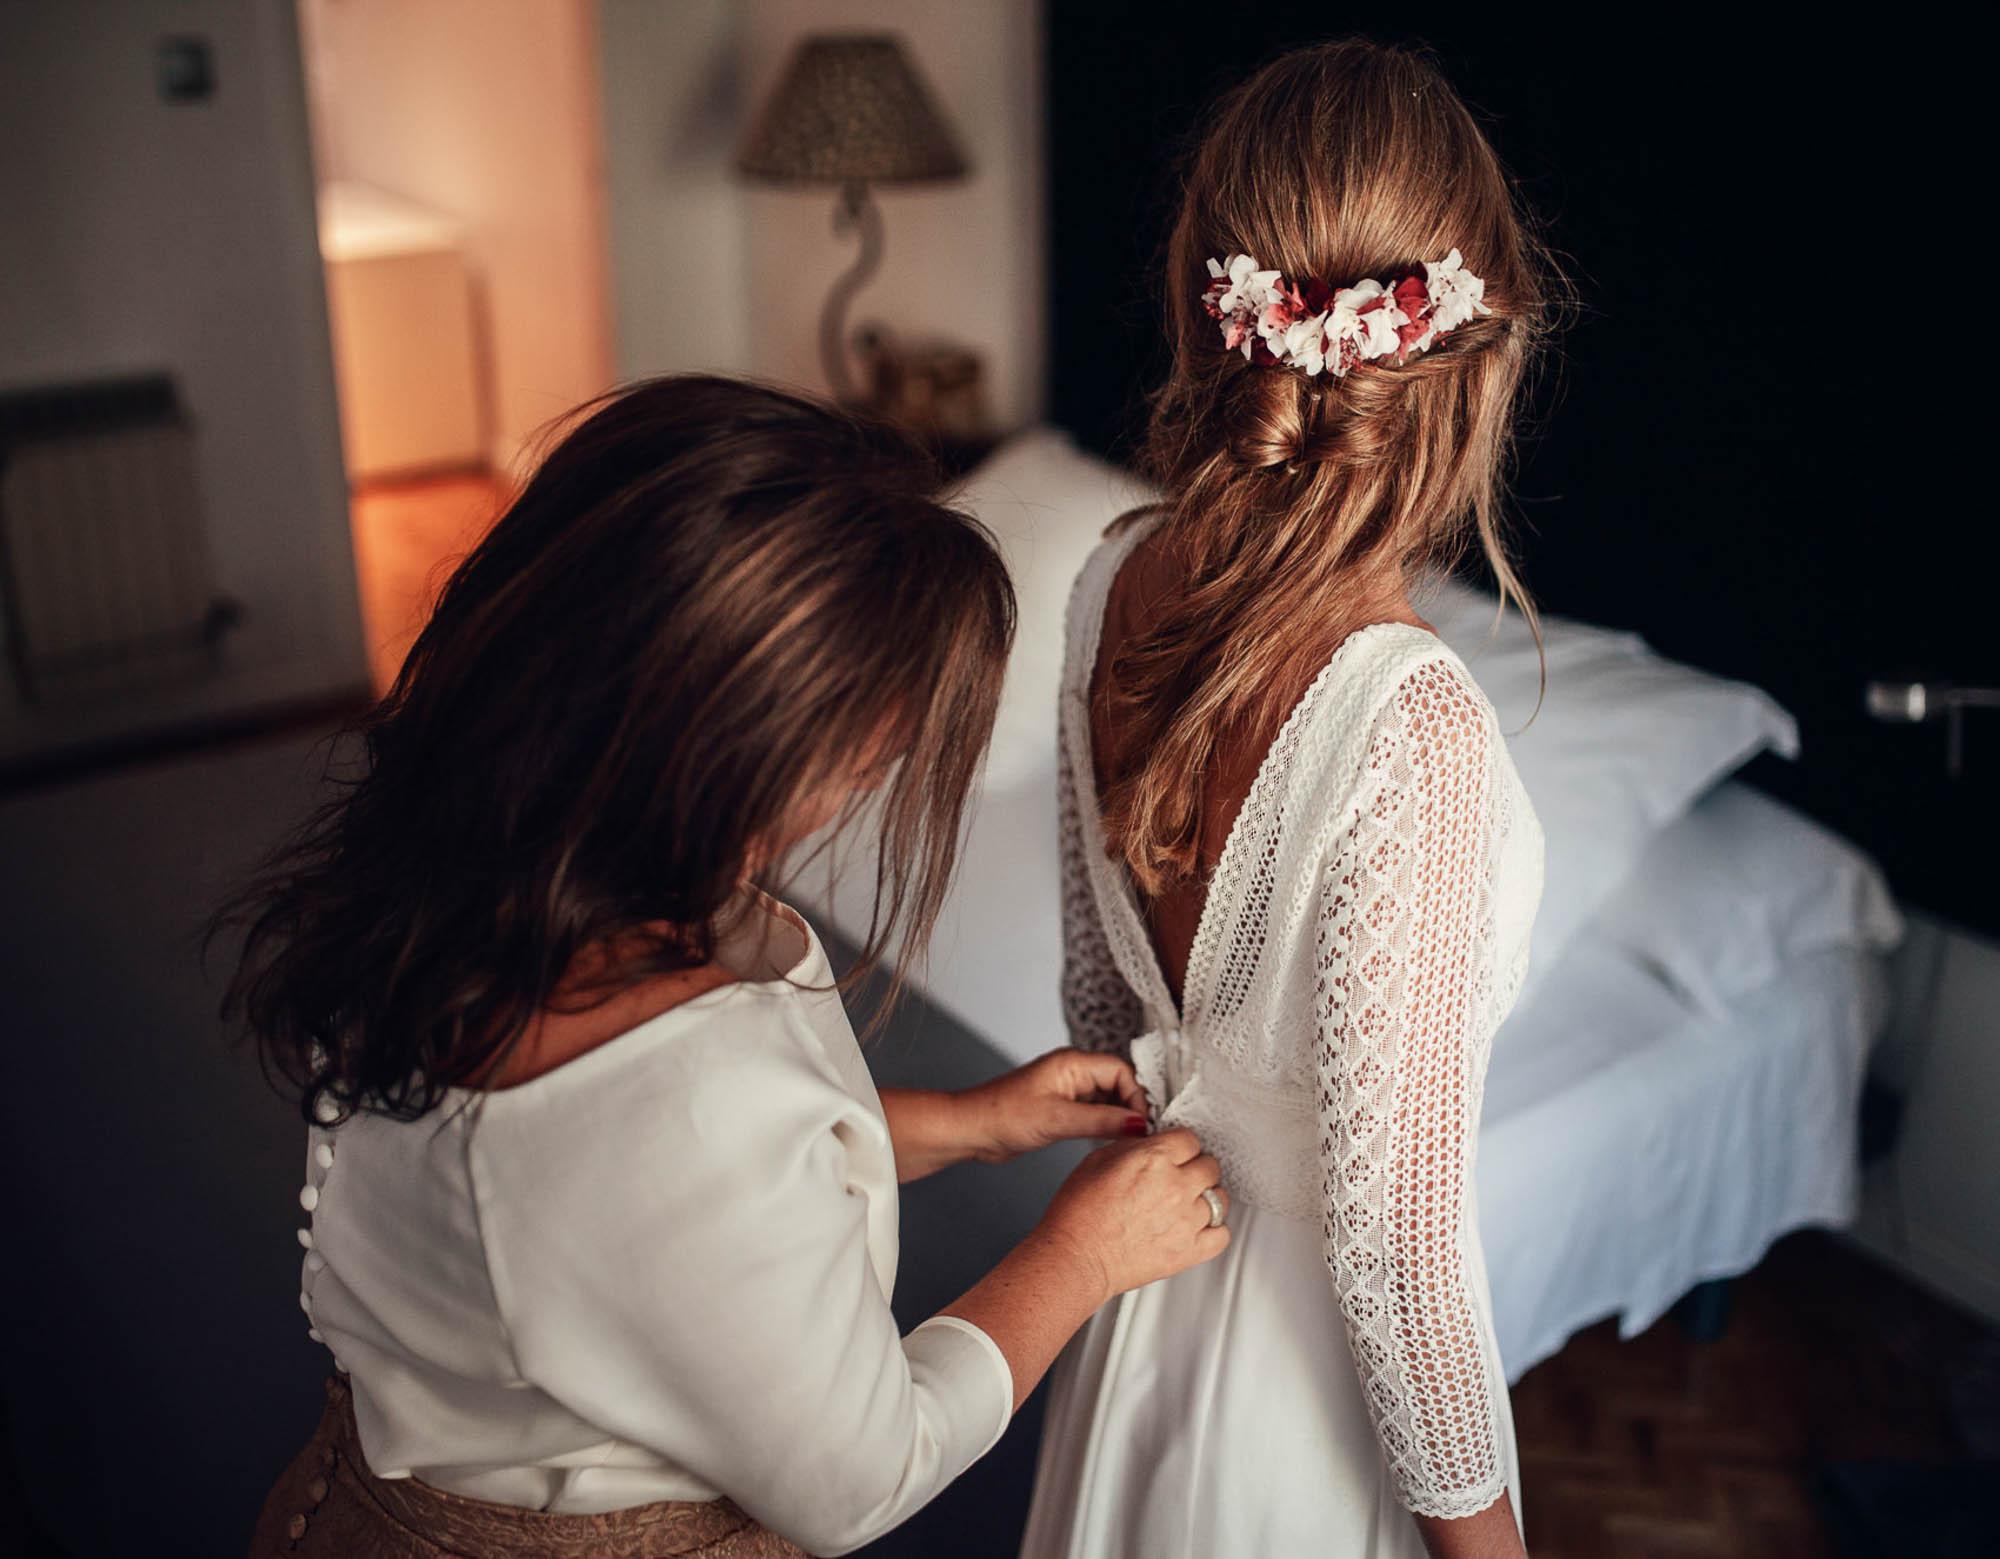 detalle flores tocado corona novia vestido botones wedding